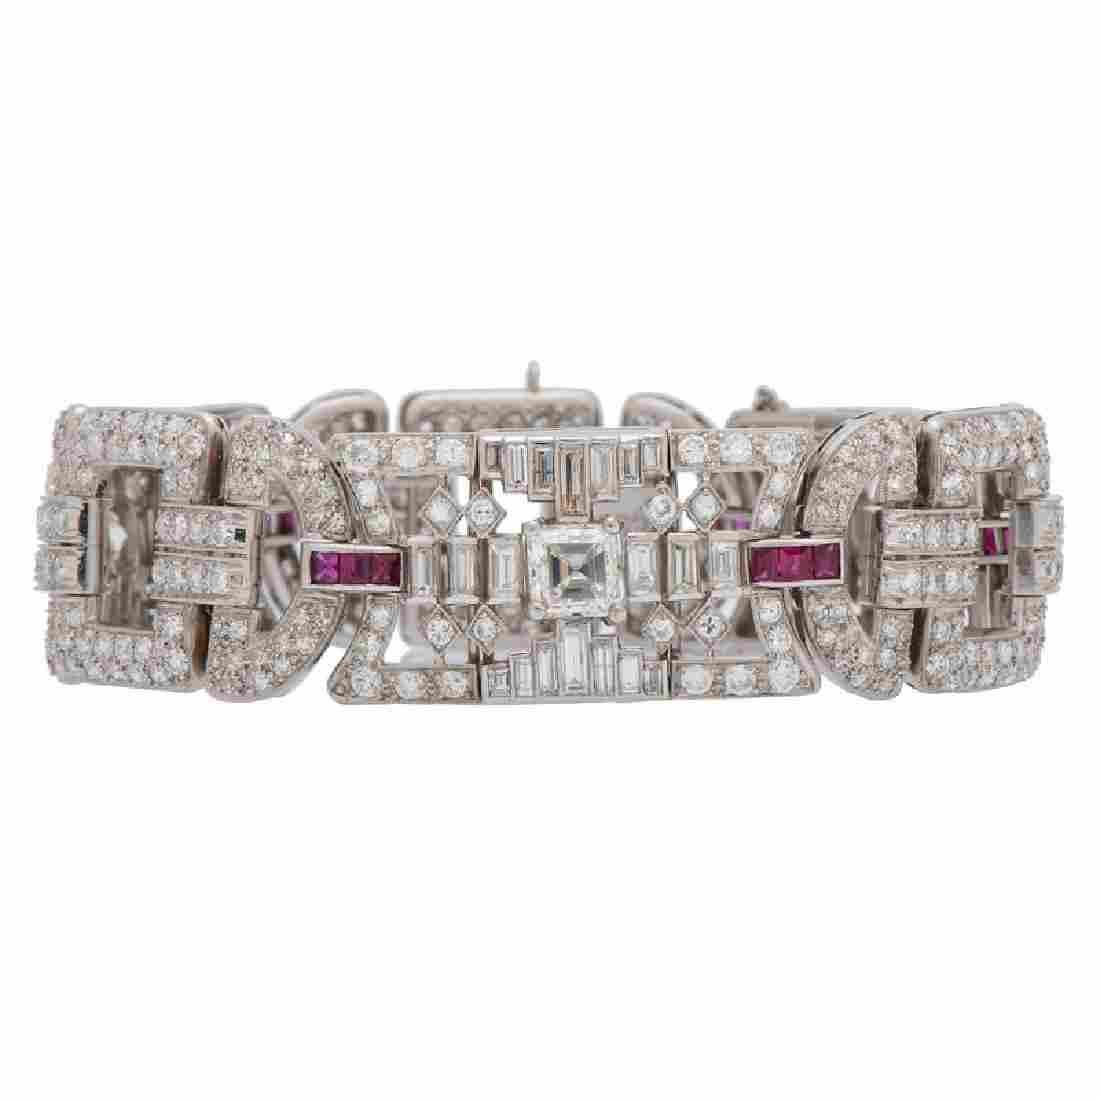 Tiffany & Co. Art-Deco Diamond and Ruby Bracelet in